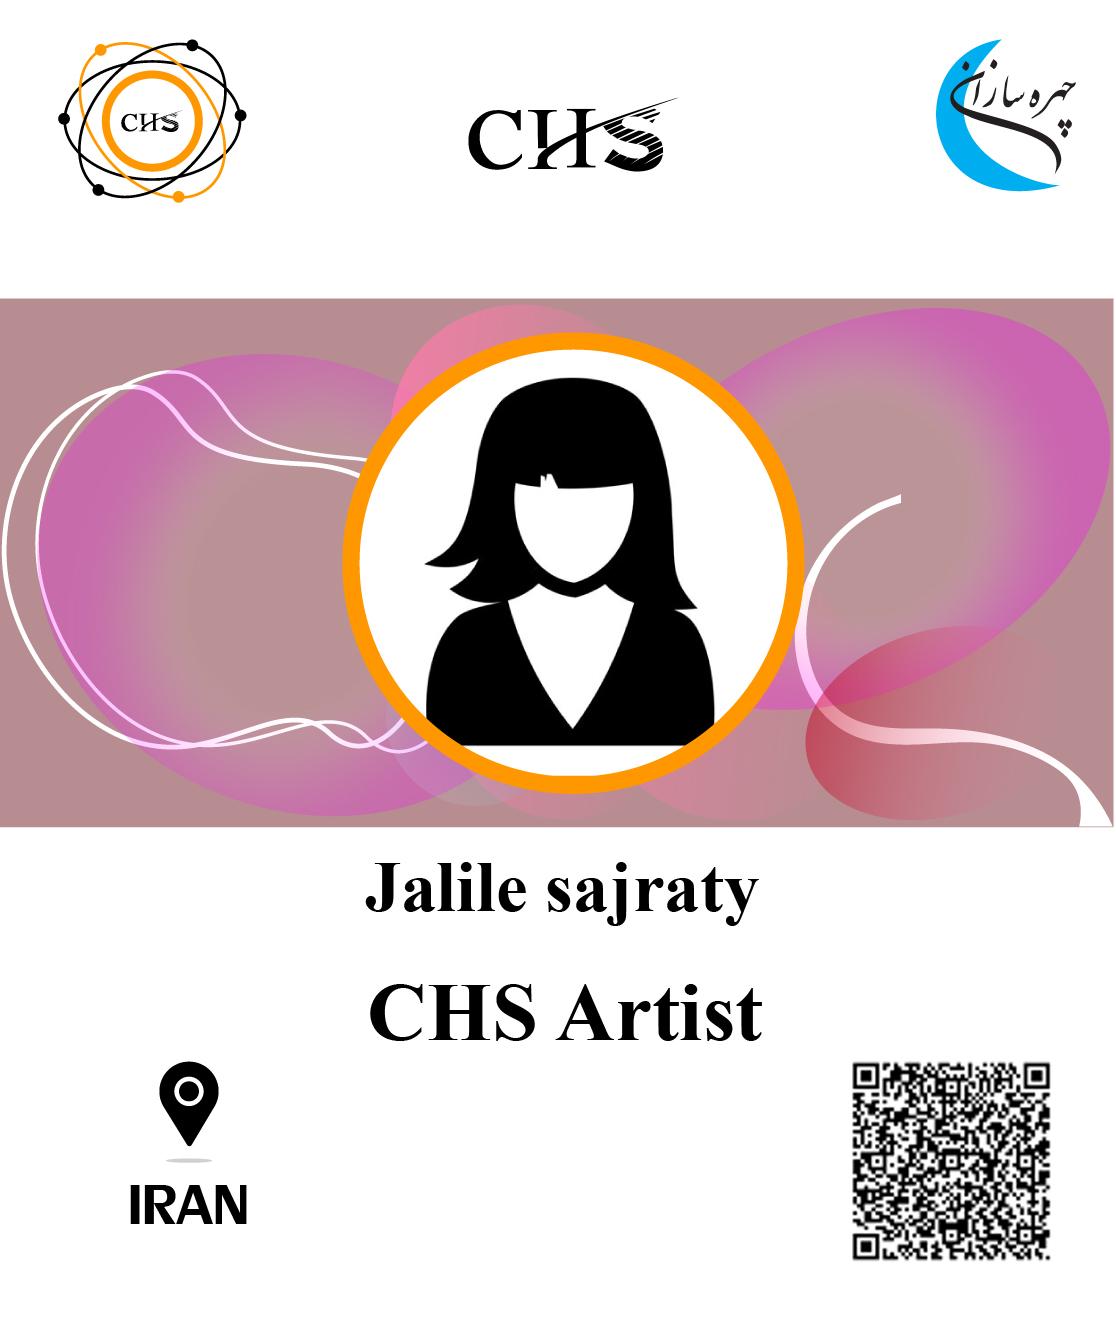 Jalile sajraty, Shinion certificate, Shinion training, Shinion certificate, Shinion, Shinion Jalile sajraty, Shinion training certificate Jalile sajraty